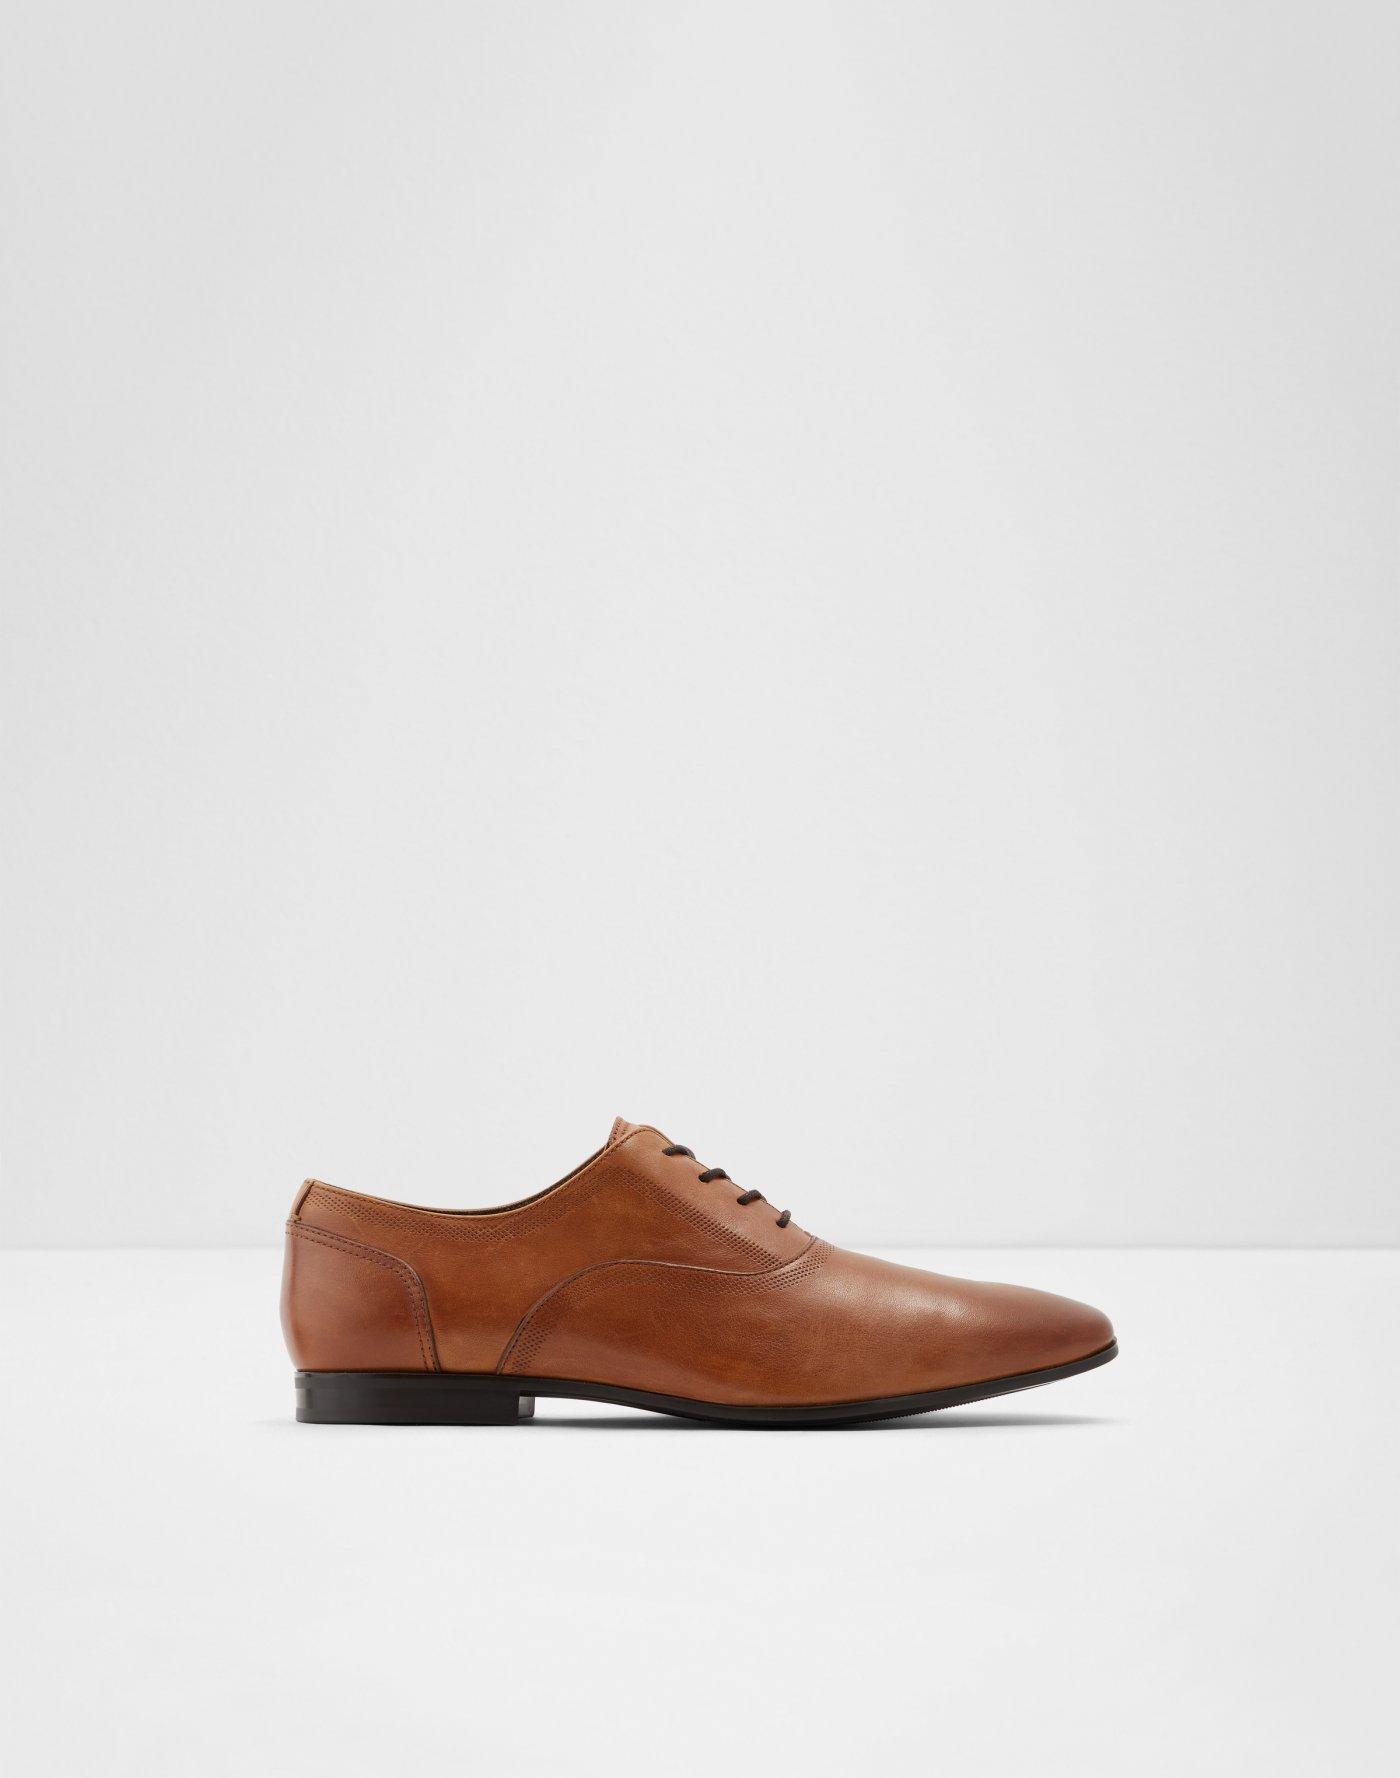 3be2ff20865e1 Men's Dress Shoes   Formal & Oxford Shoes For Men   ALDO US   Aldoshoes.com  US